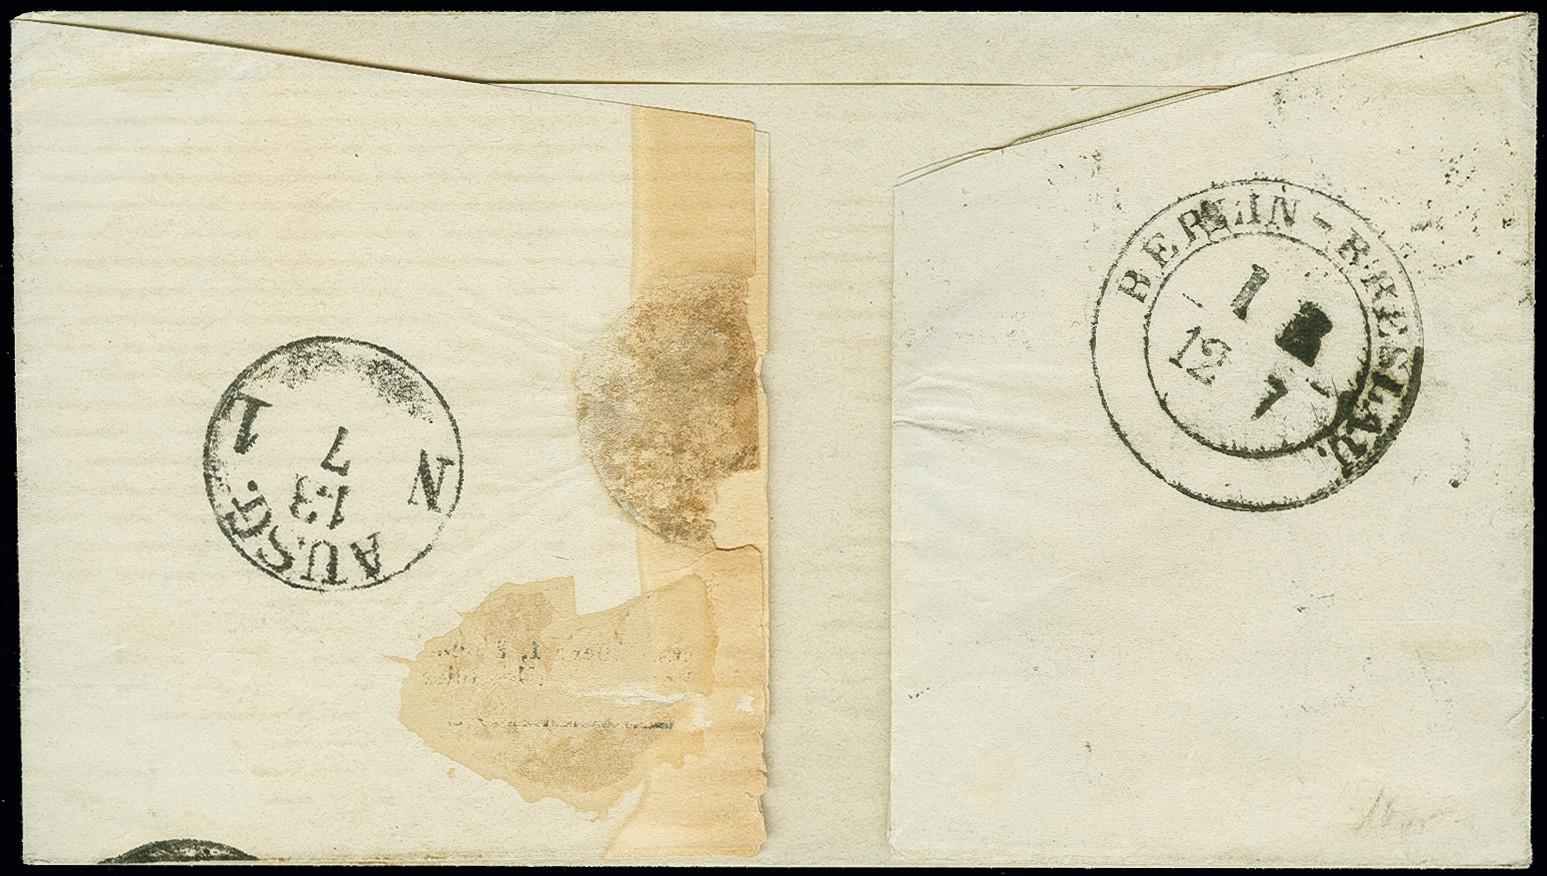 Lot 3446 - prussia prussia - cancellations -  Heinrich Koehler Auktionen Auction #368- Day 5